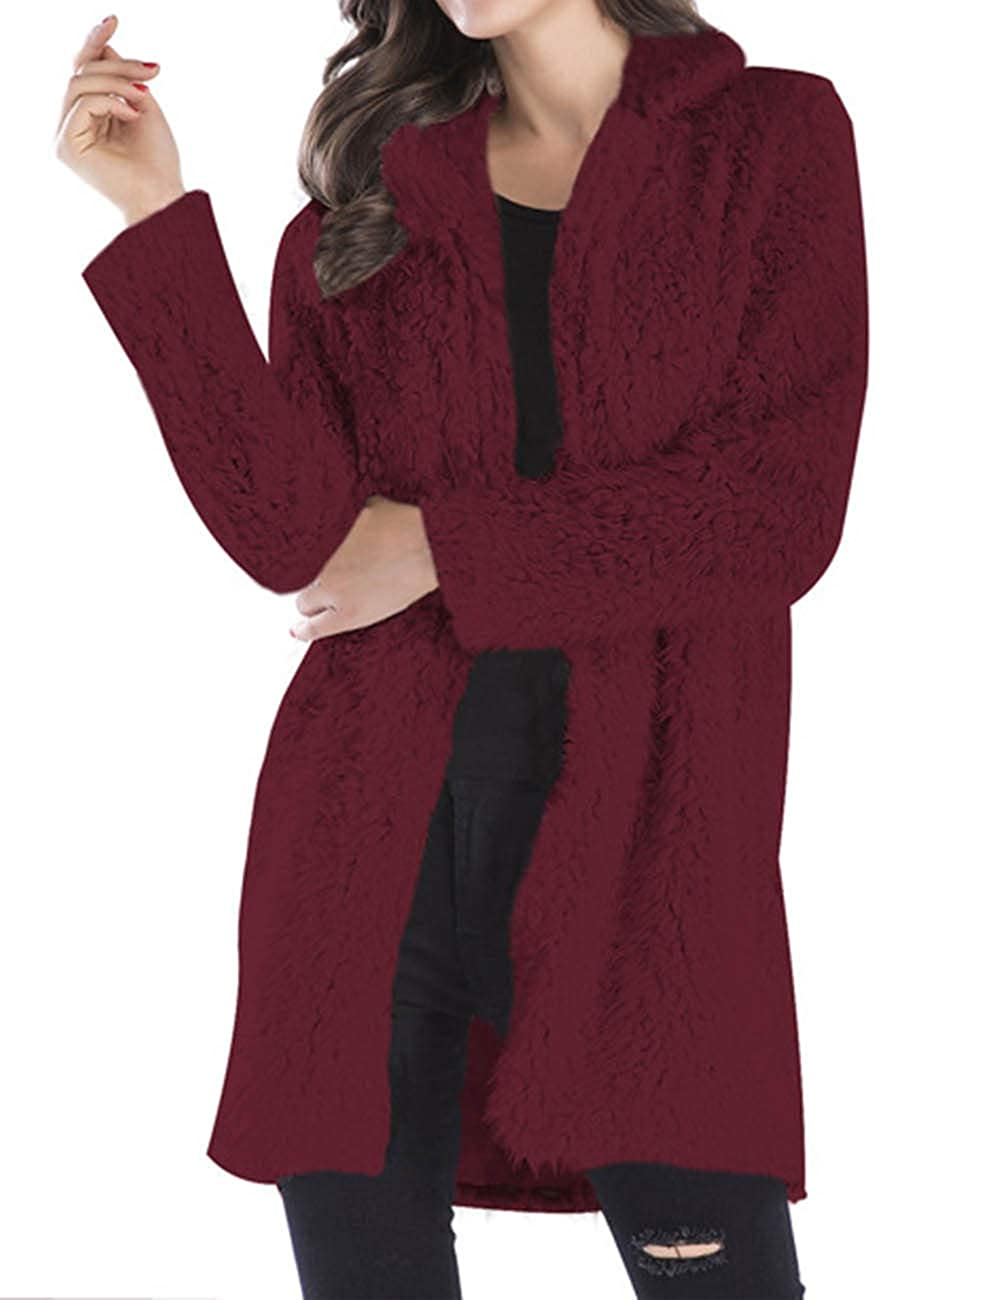 XXXITICAT Women's Fuzzy Faux Fur Coat Long Sleeve Jacket